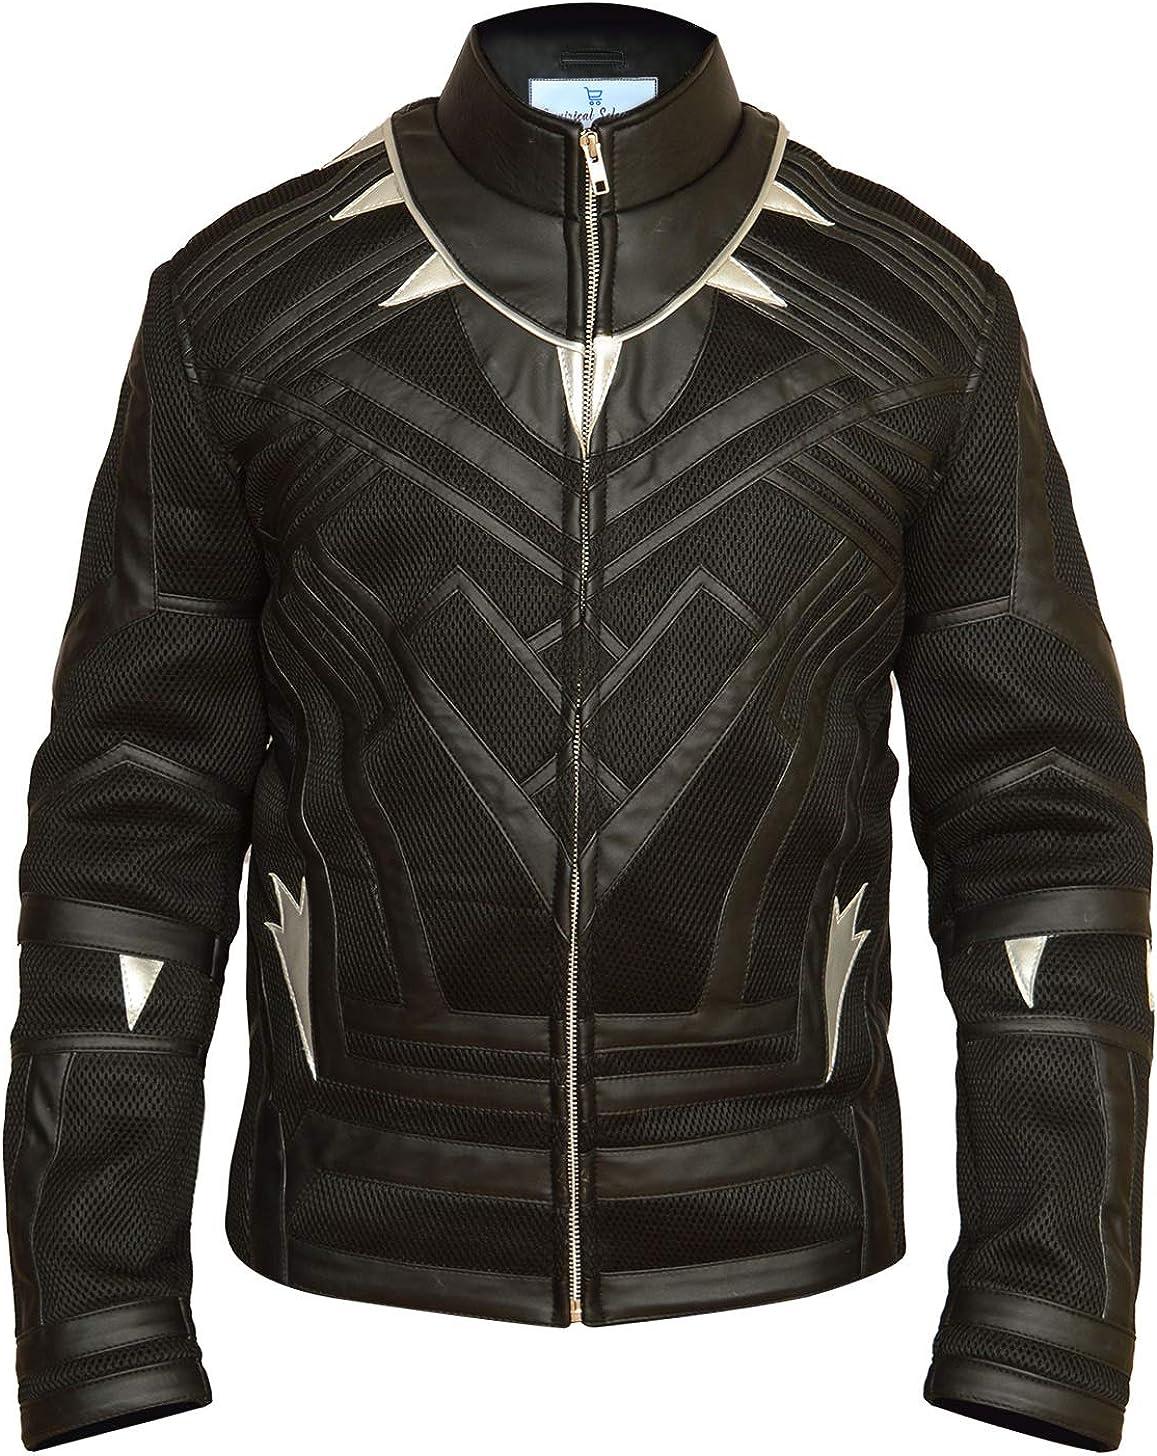 Empirical Selection Faux Leather Jackets Men Men/'s Faux Leather Jacket